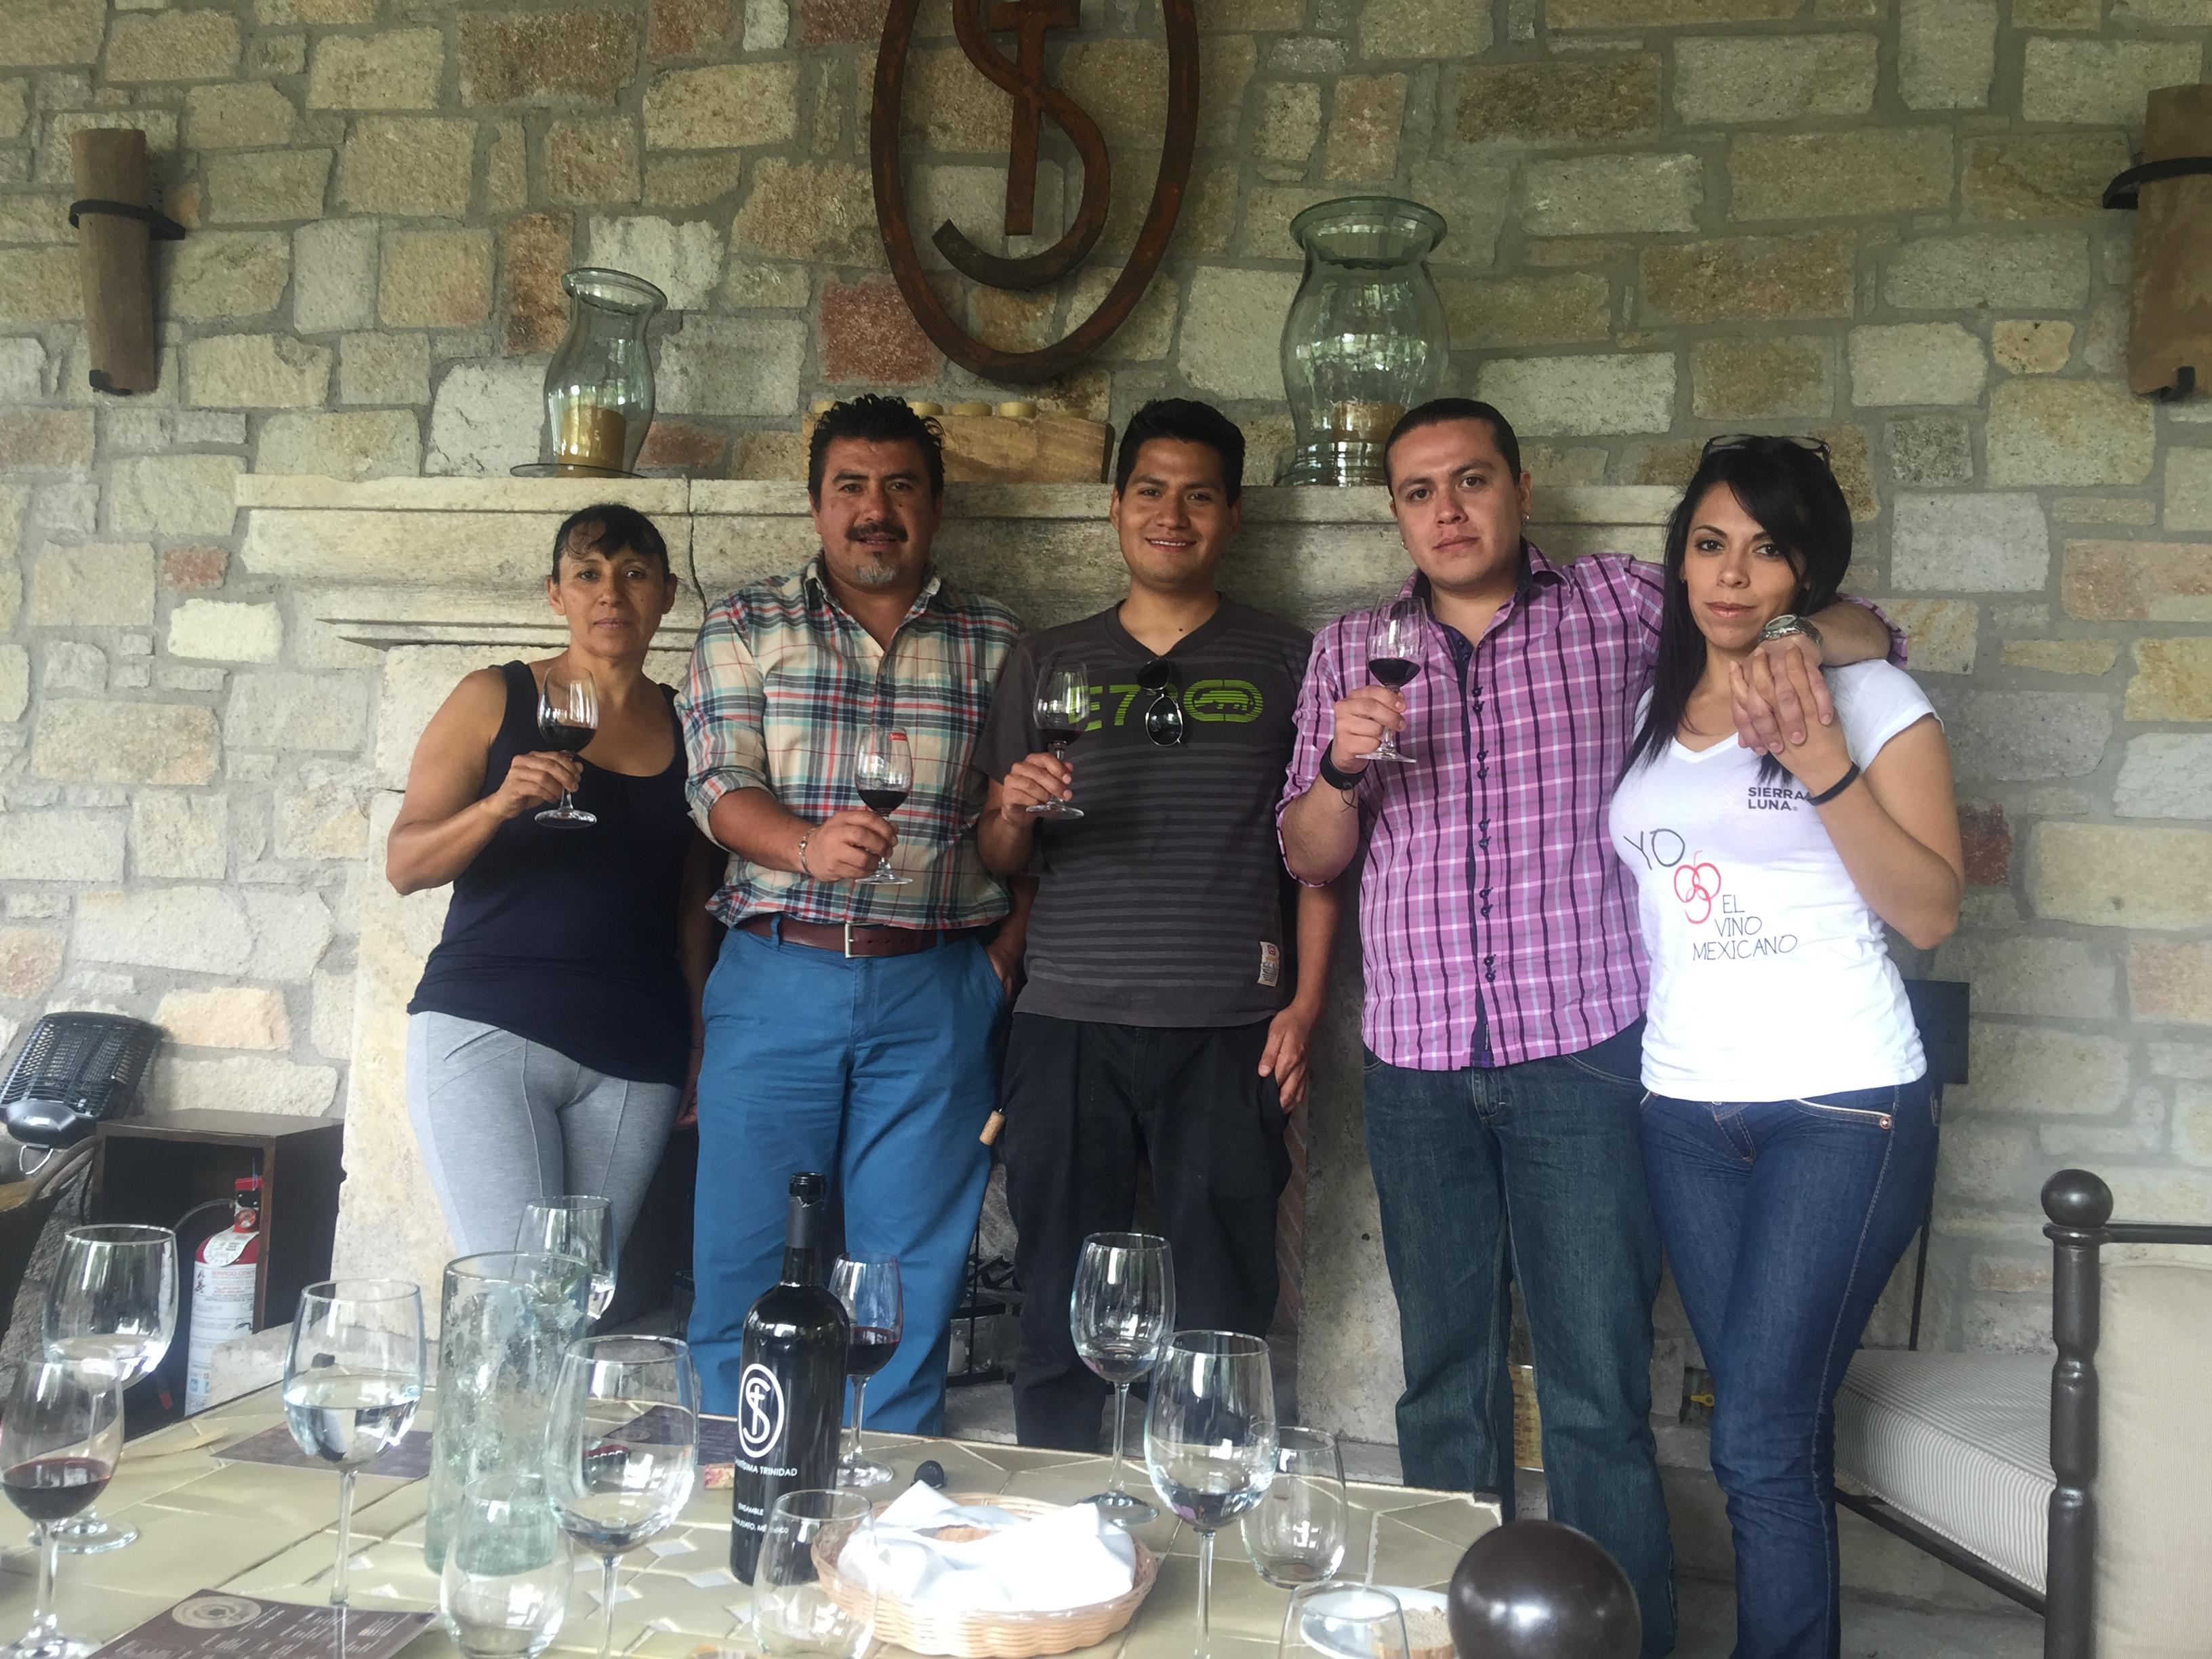 Cata de vinos mexicanos